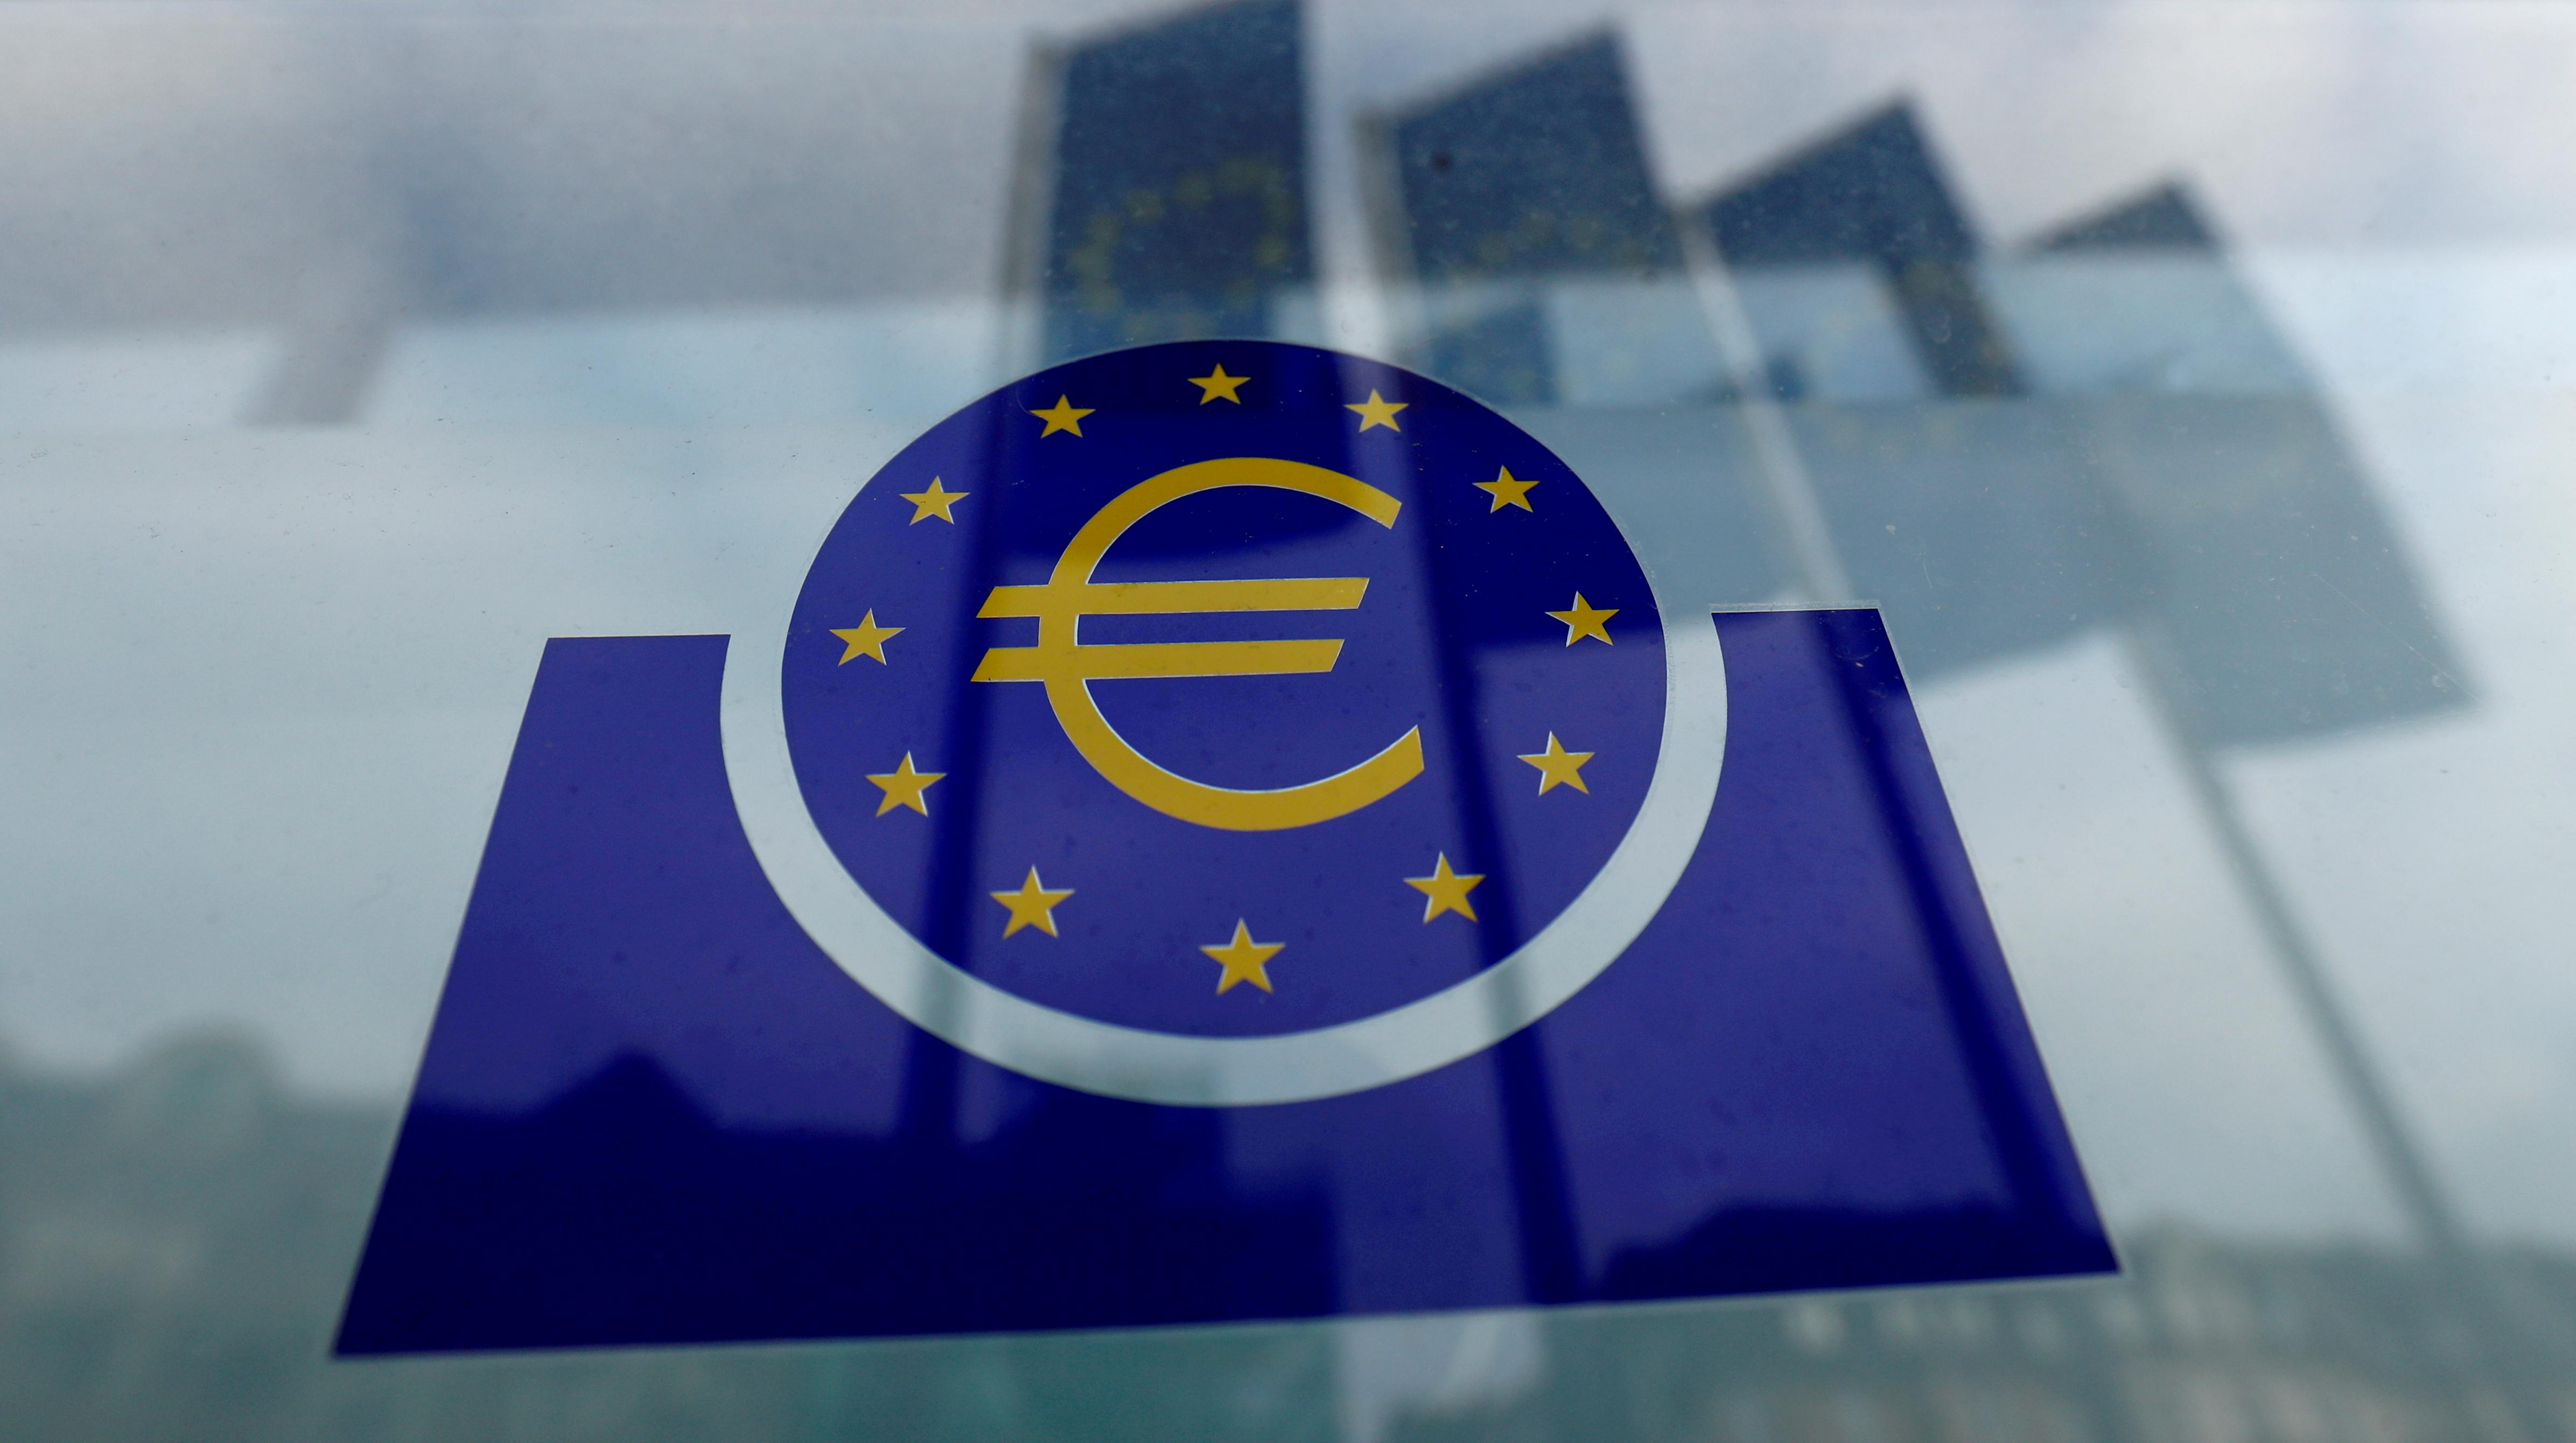 The European Central Bank (ECB) logo in Frankfurt, Germany, January 23, 2020. REUTERS/Ralph Orlowski